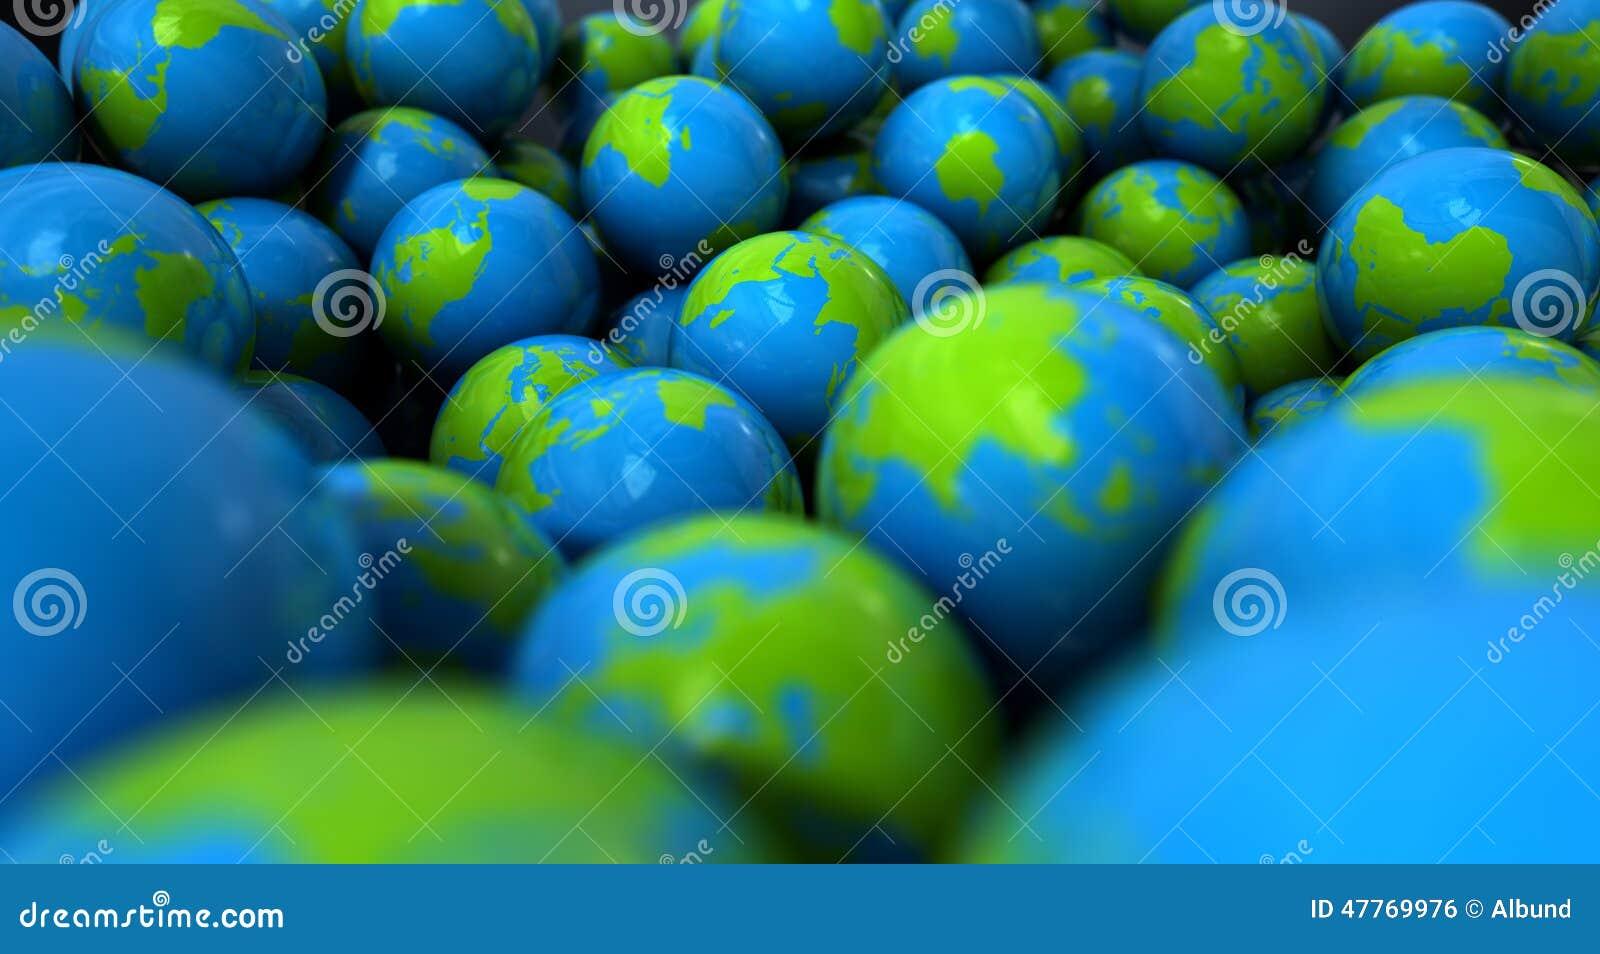 Globe business plan dsl extreme